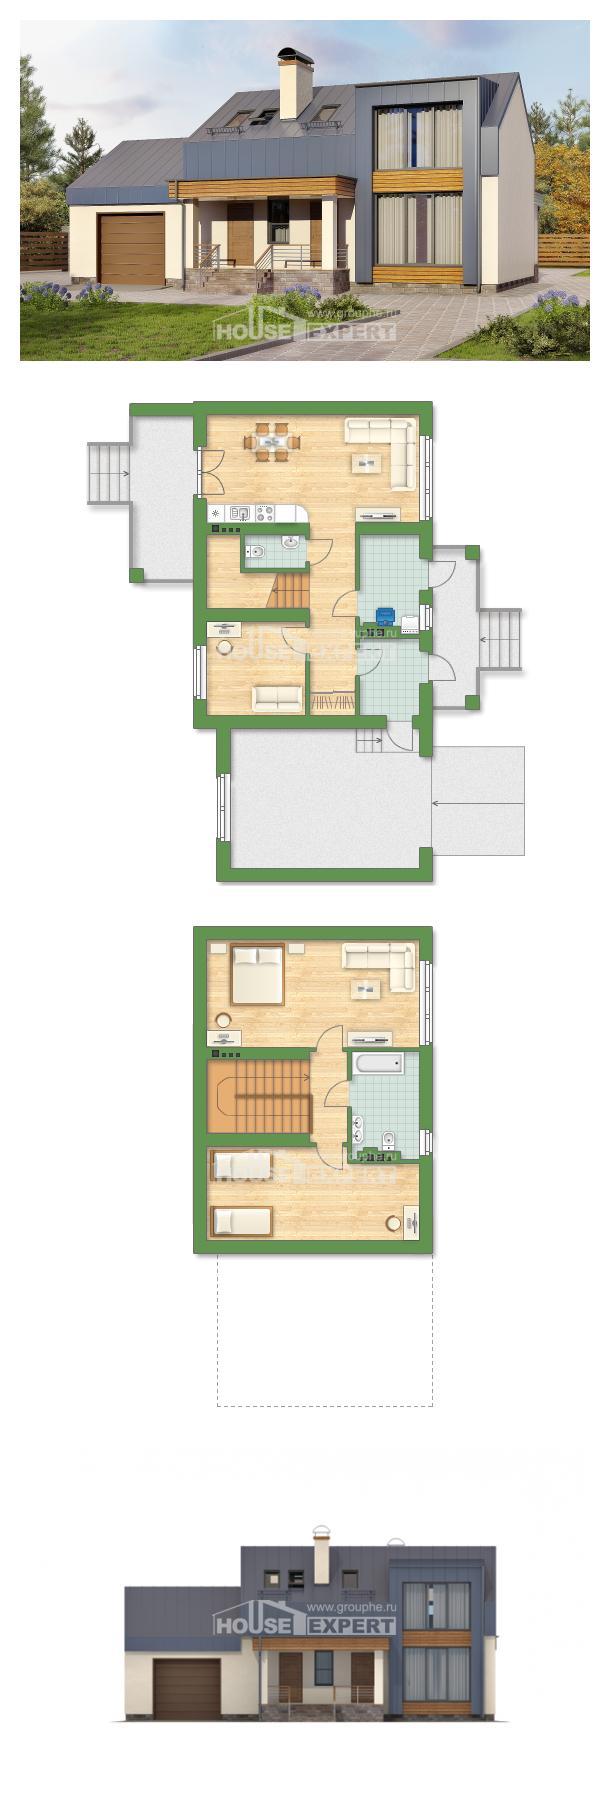 Projekt domu 150-015-R | House Expert